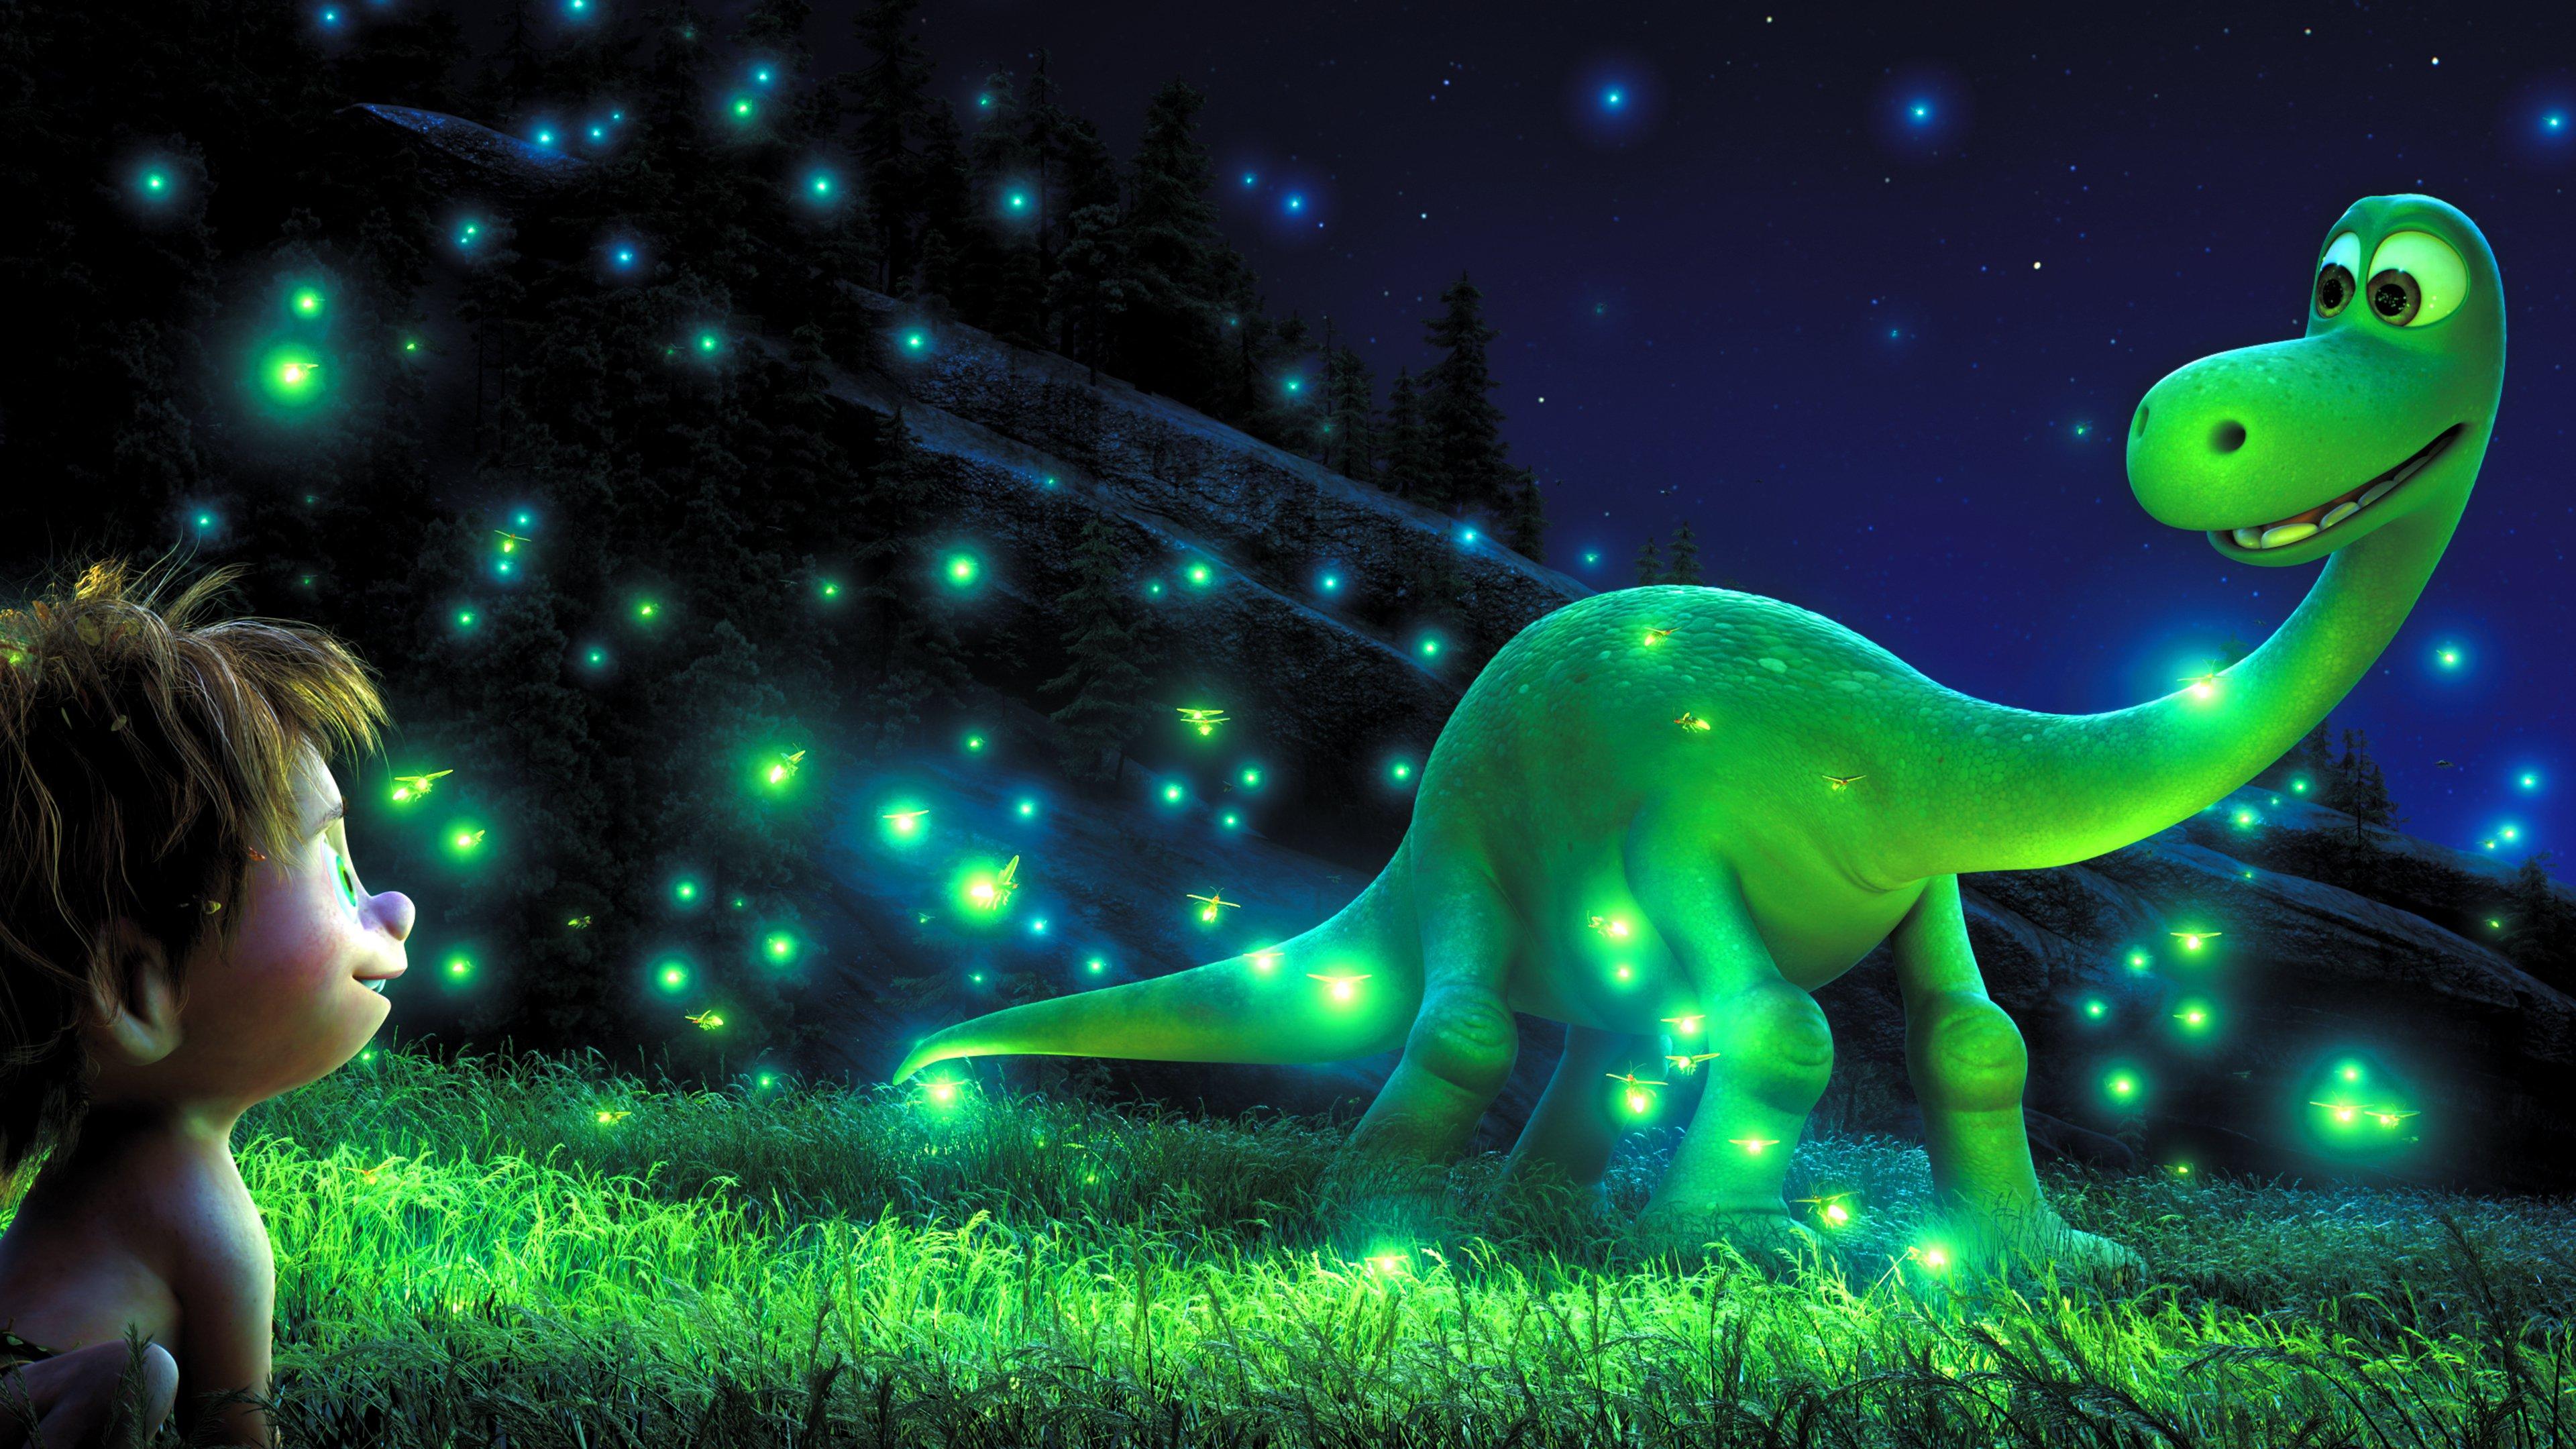 15 The Good Dinosaur HD Wallpapers